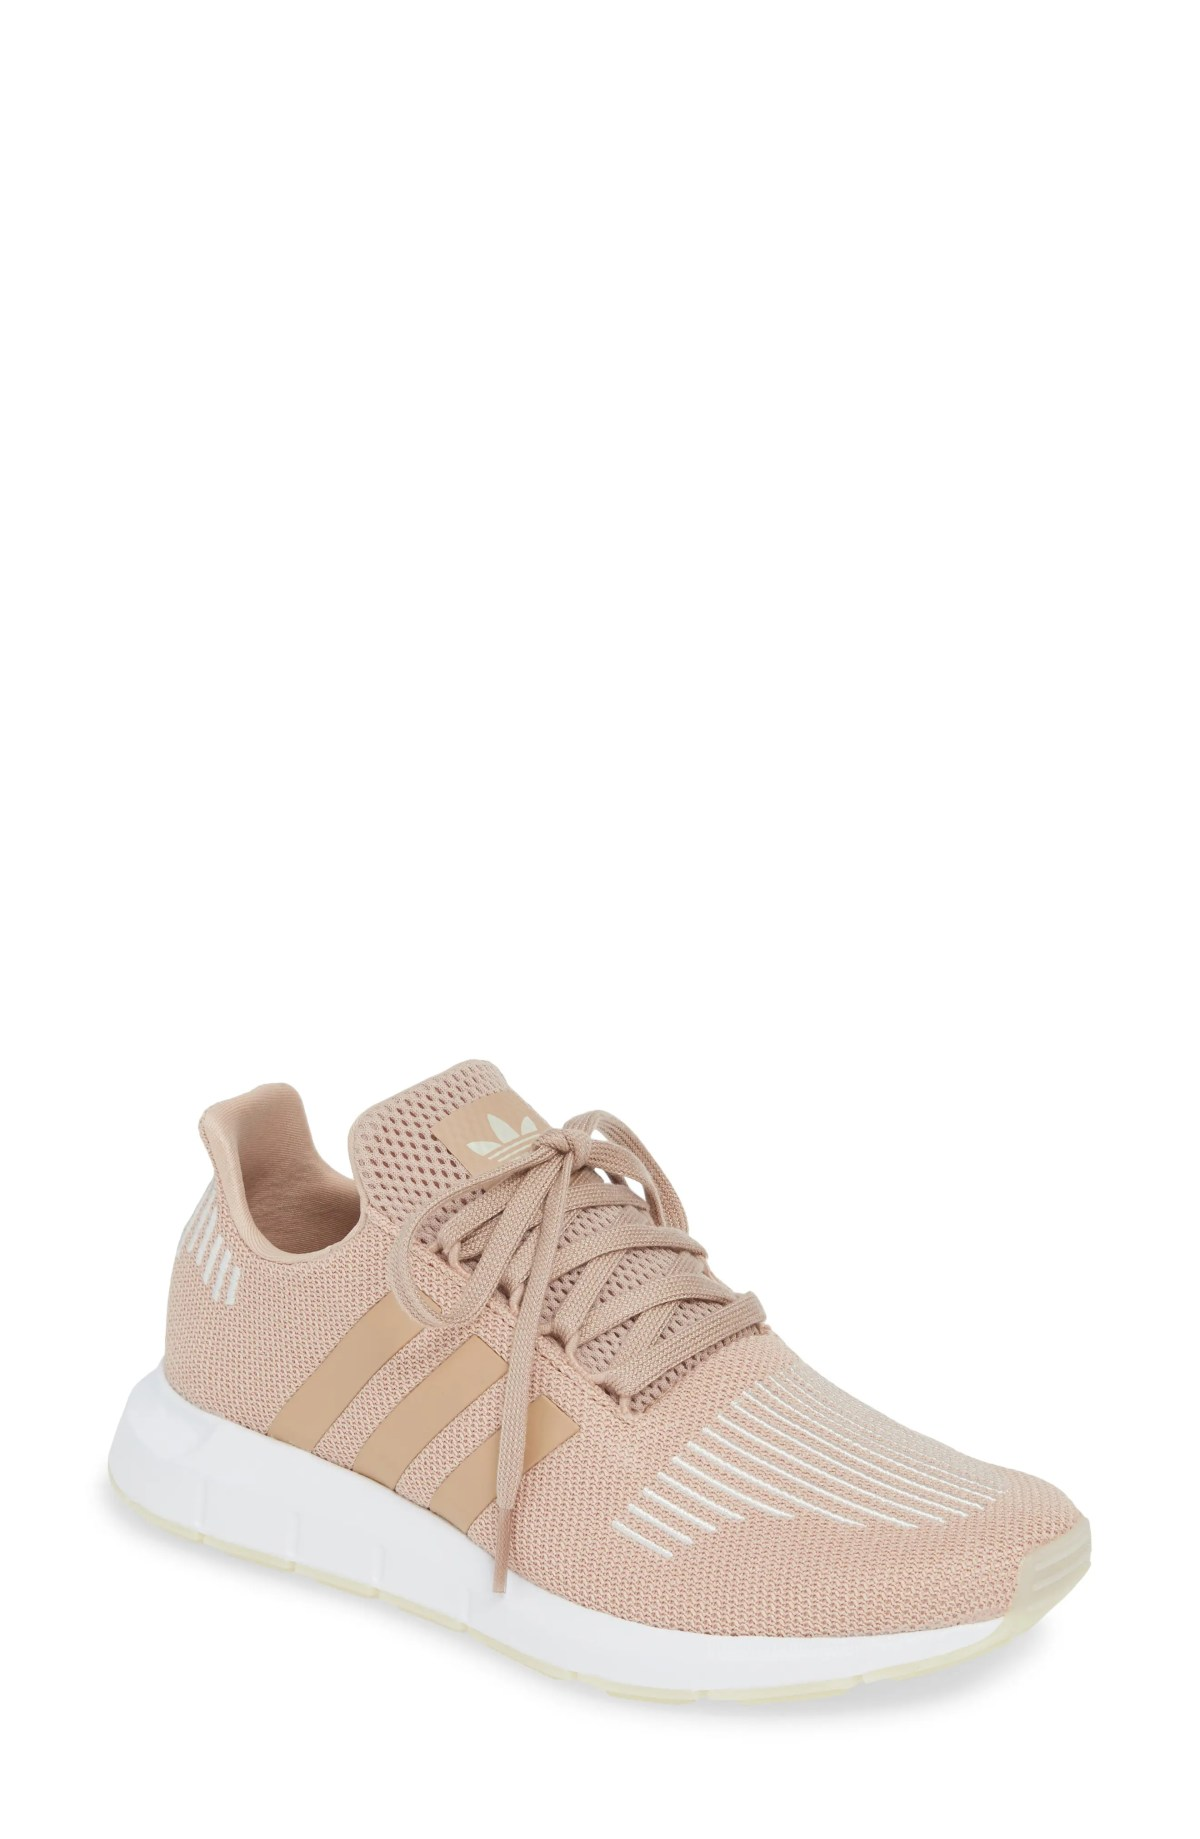 ADIDAS Swift Run Sneaker, Main, color, ASH PEARL/ OFF WHITE/ WHITE